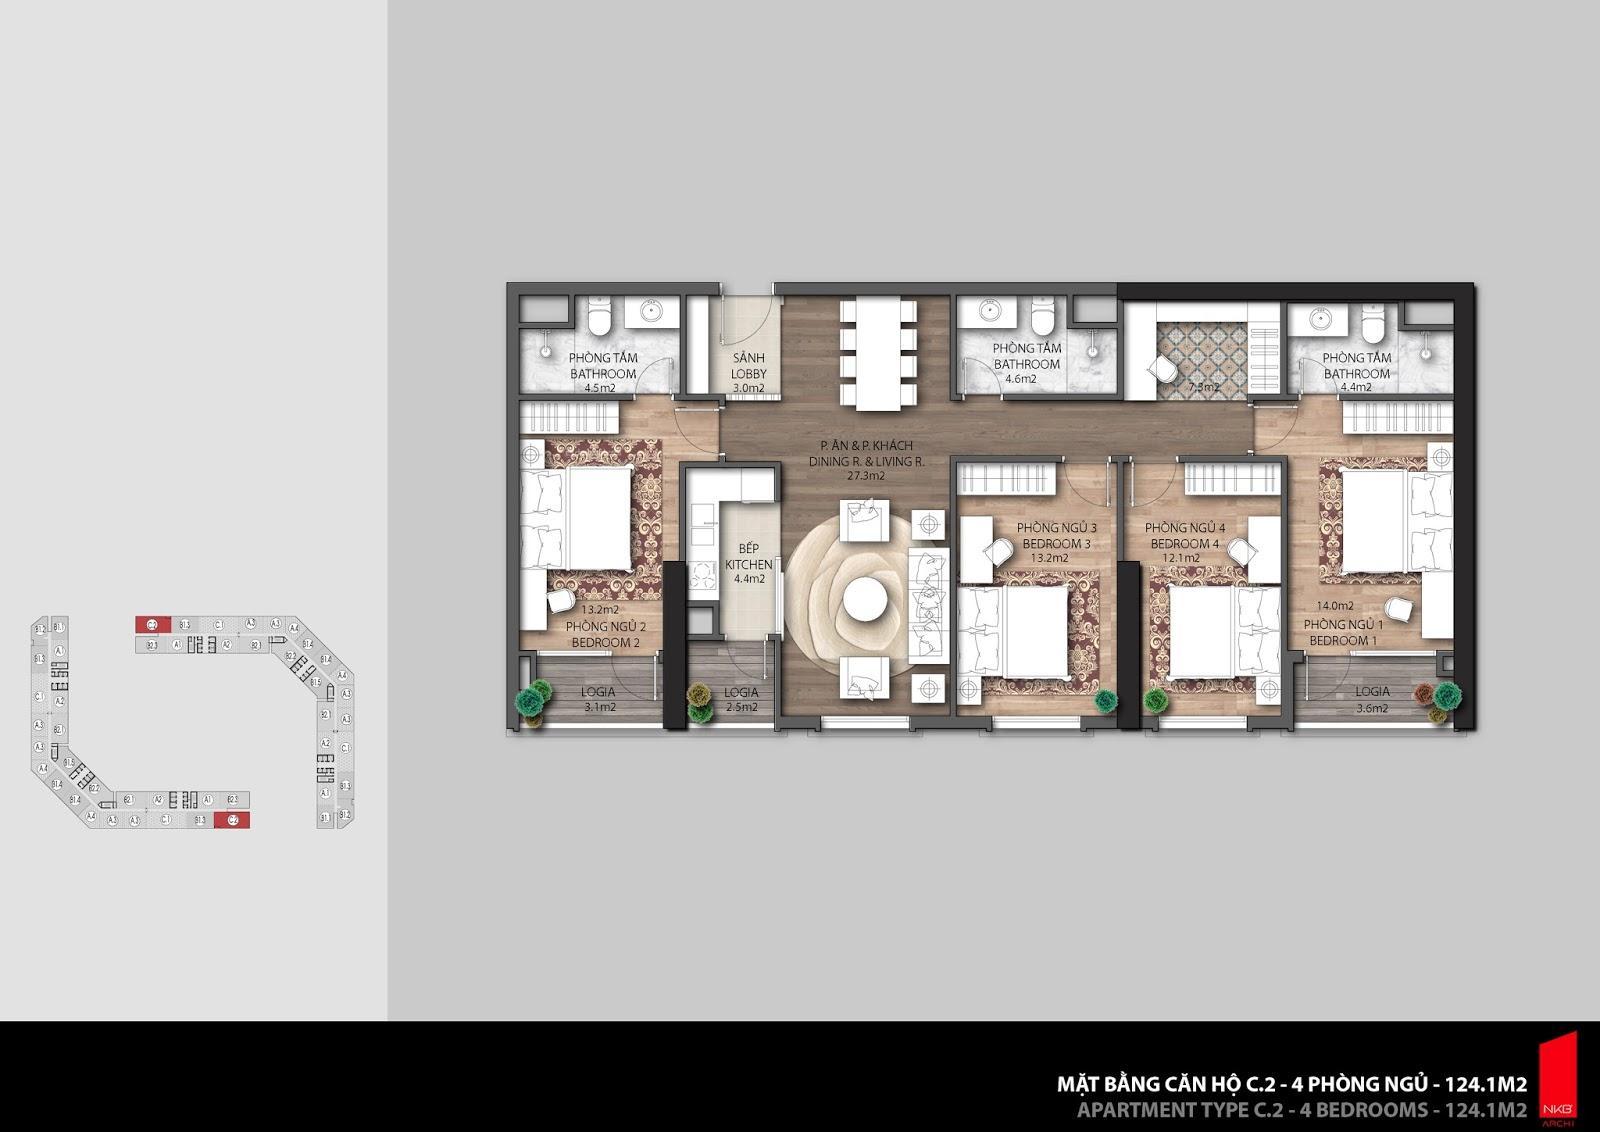 Mặt bằng căn hộ 124,1m2